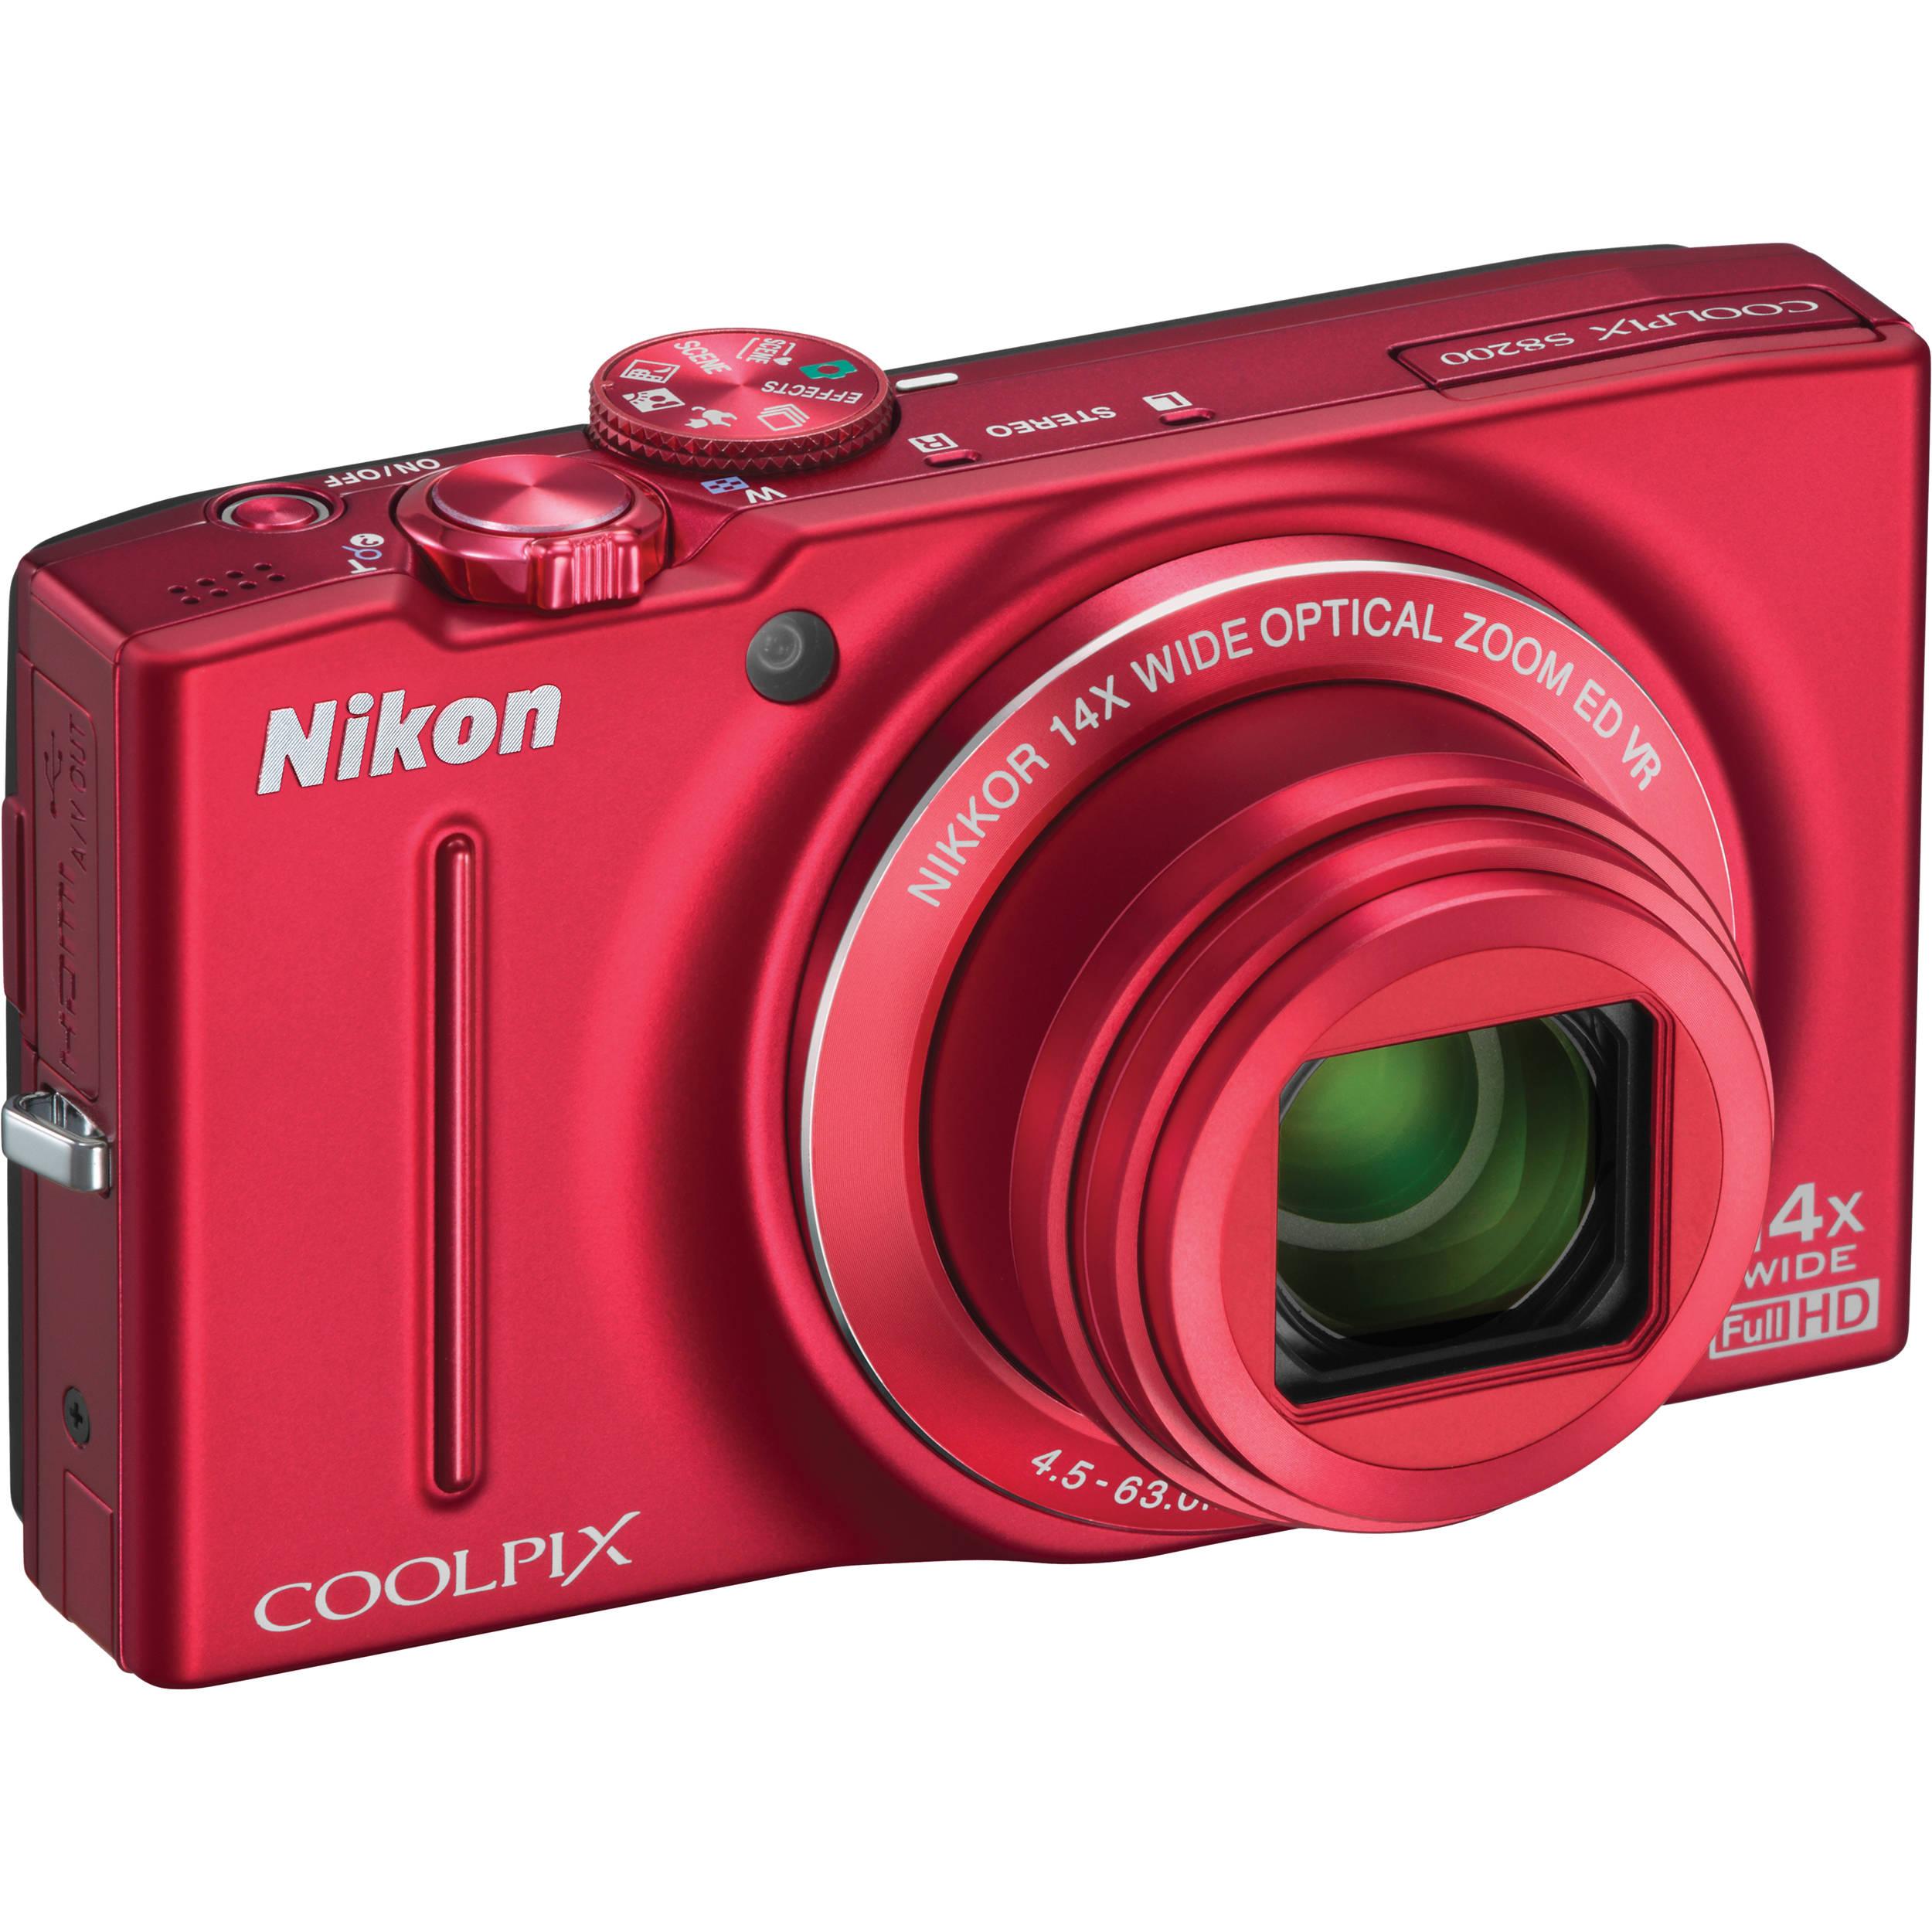 used nikon coolpix s8200 digital camera red 26289b b h photo rh bhphotovideo com nikon coolpix s8200 user manual nikon coolpix s8200 user manual pdf